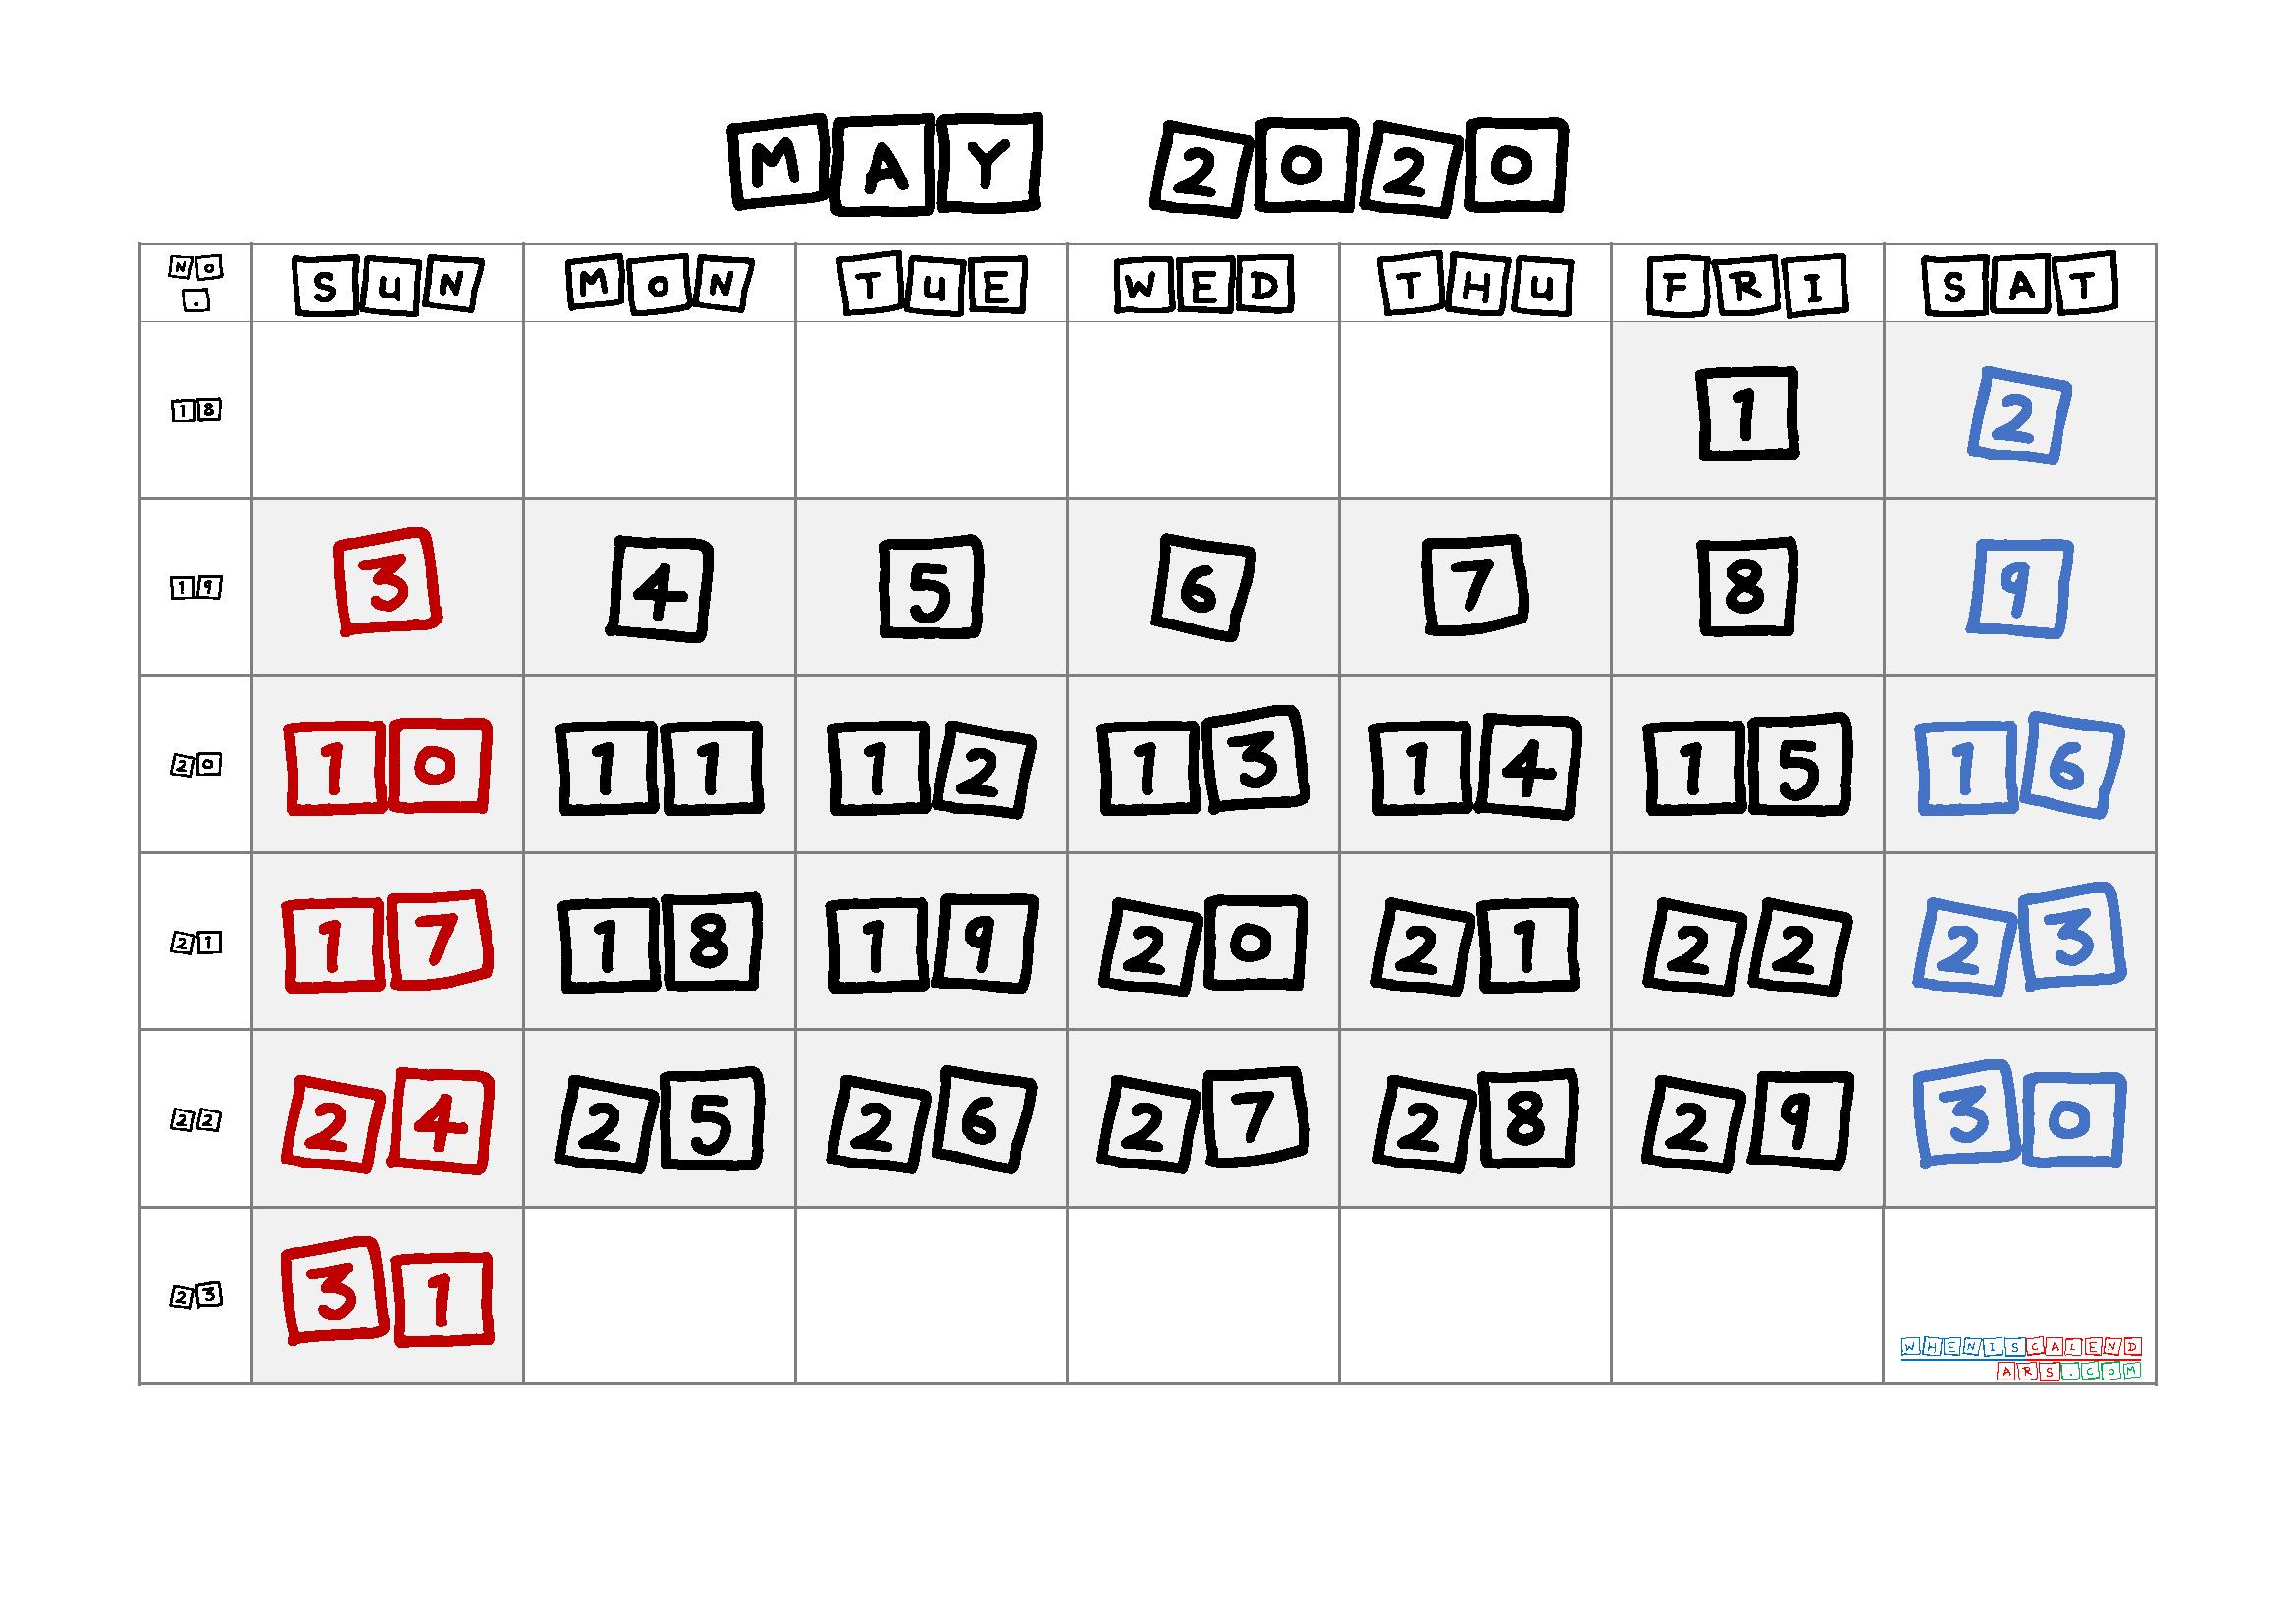 2020 May Free Printable Calendar